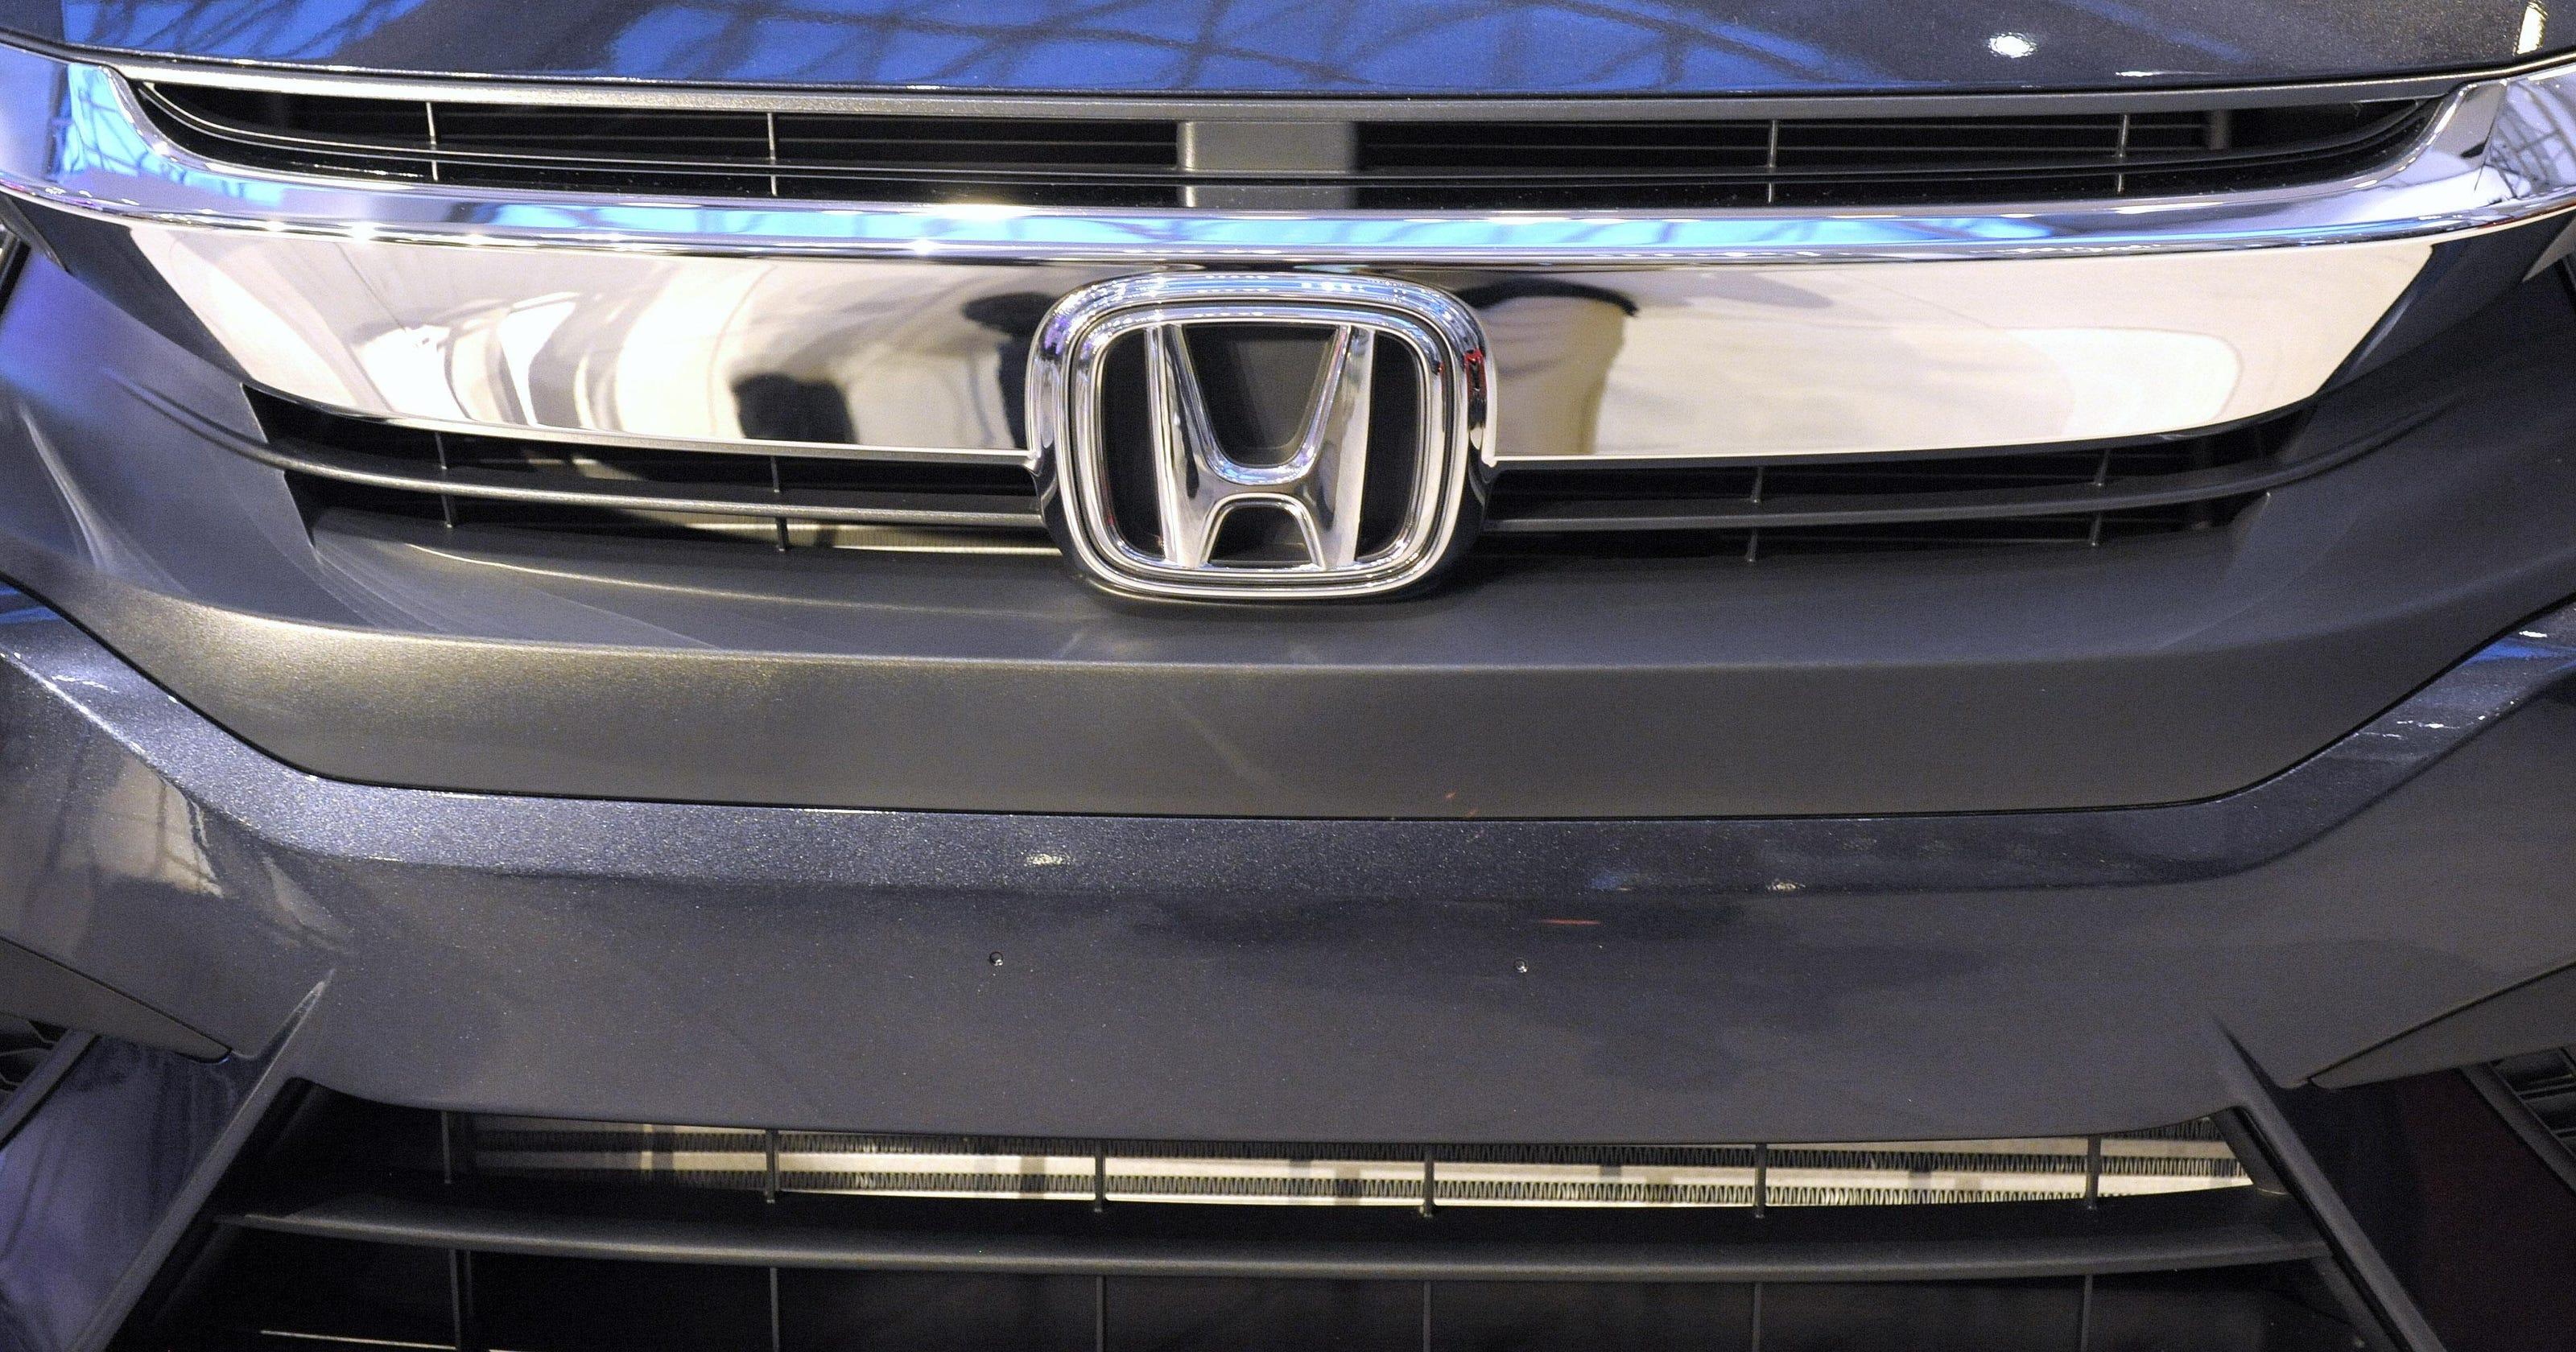 Build A Honda >> Honda Joins Gm Cruise To Build Driverless Car